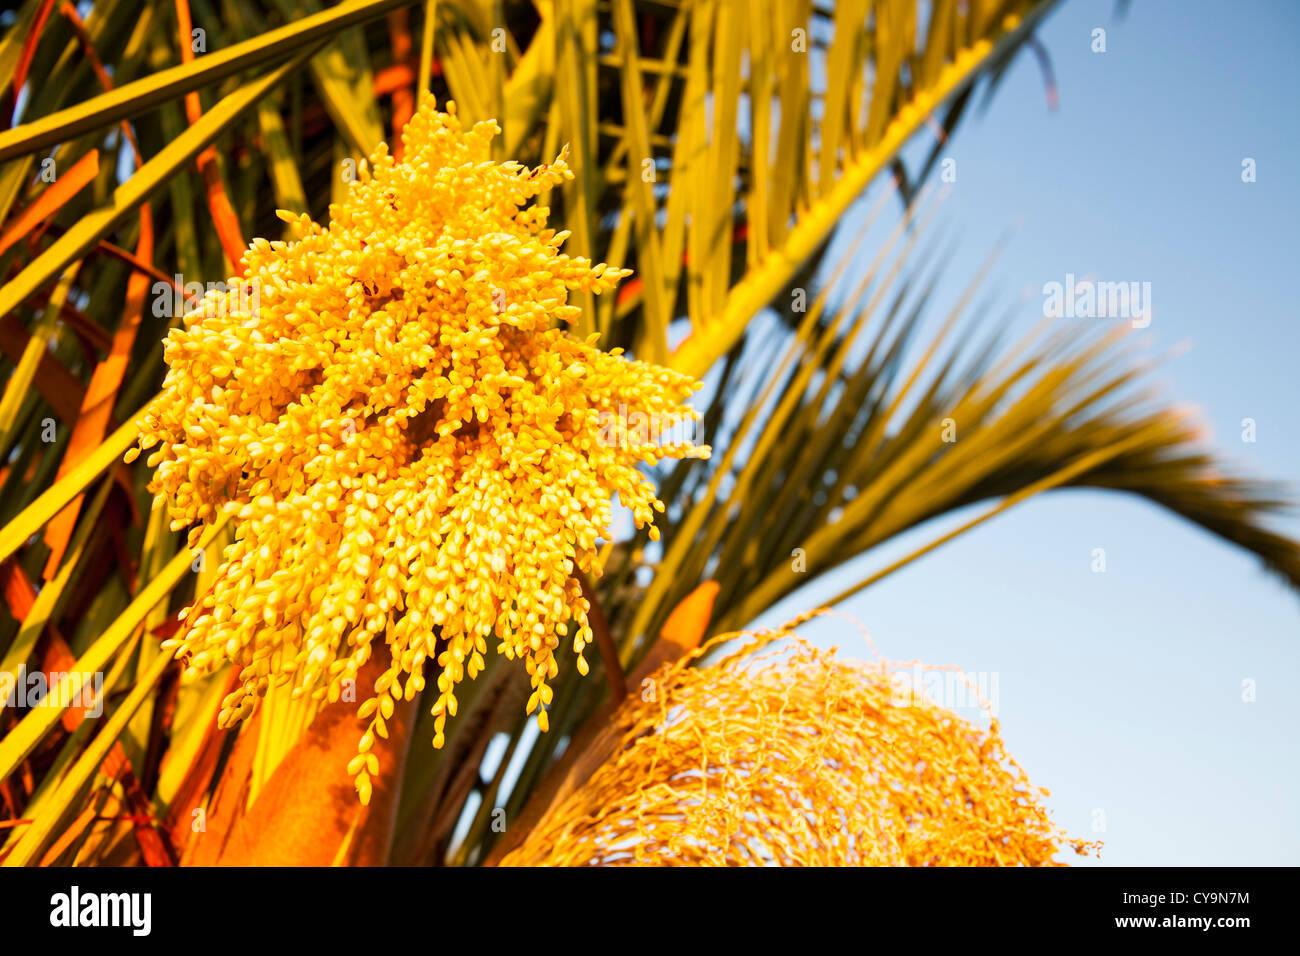 Palm tree flower yellow stock photos palm tree flower yellow stock a flowering palm tree on lemnos greece stock image mightylinksfo Gallery